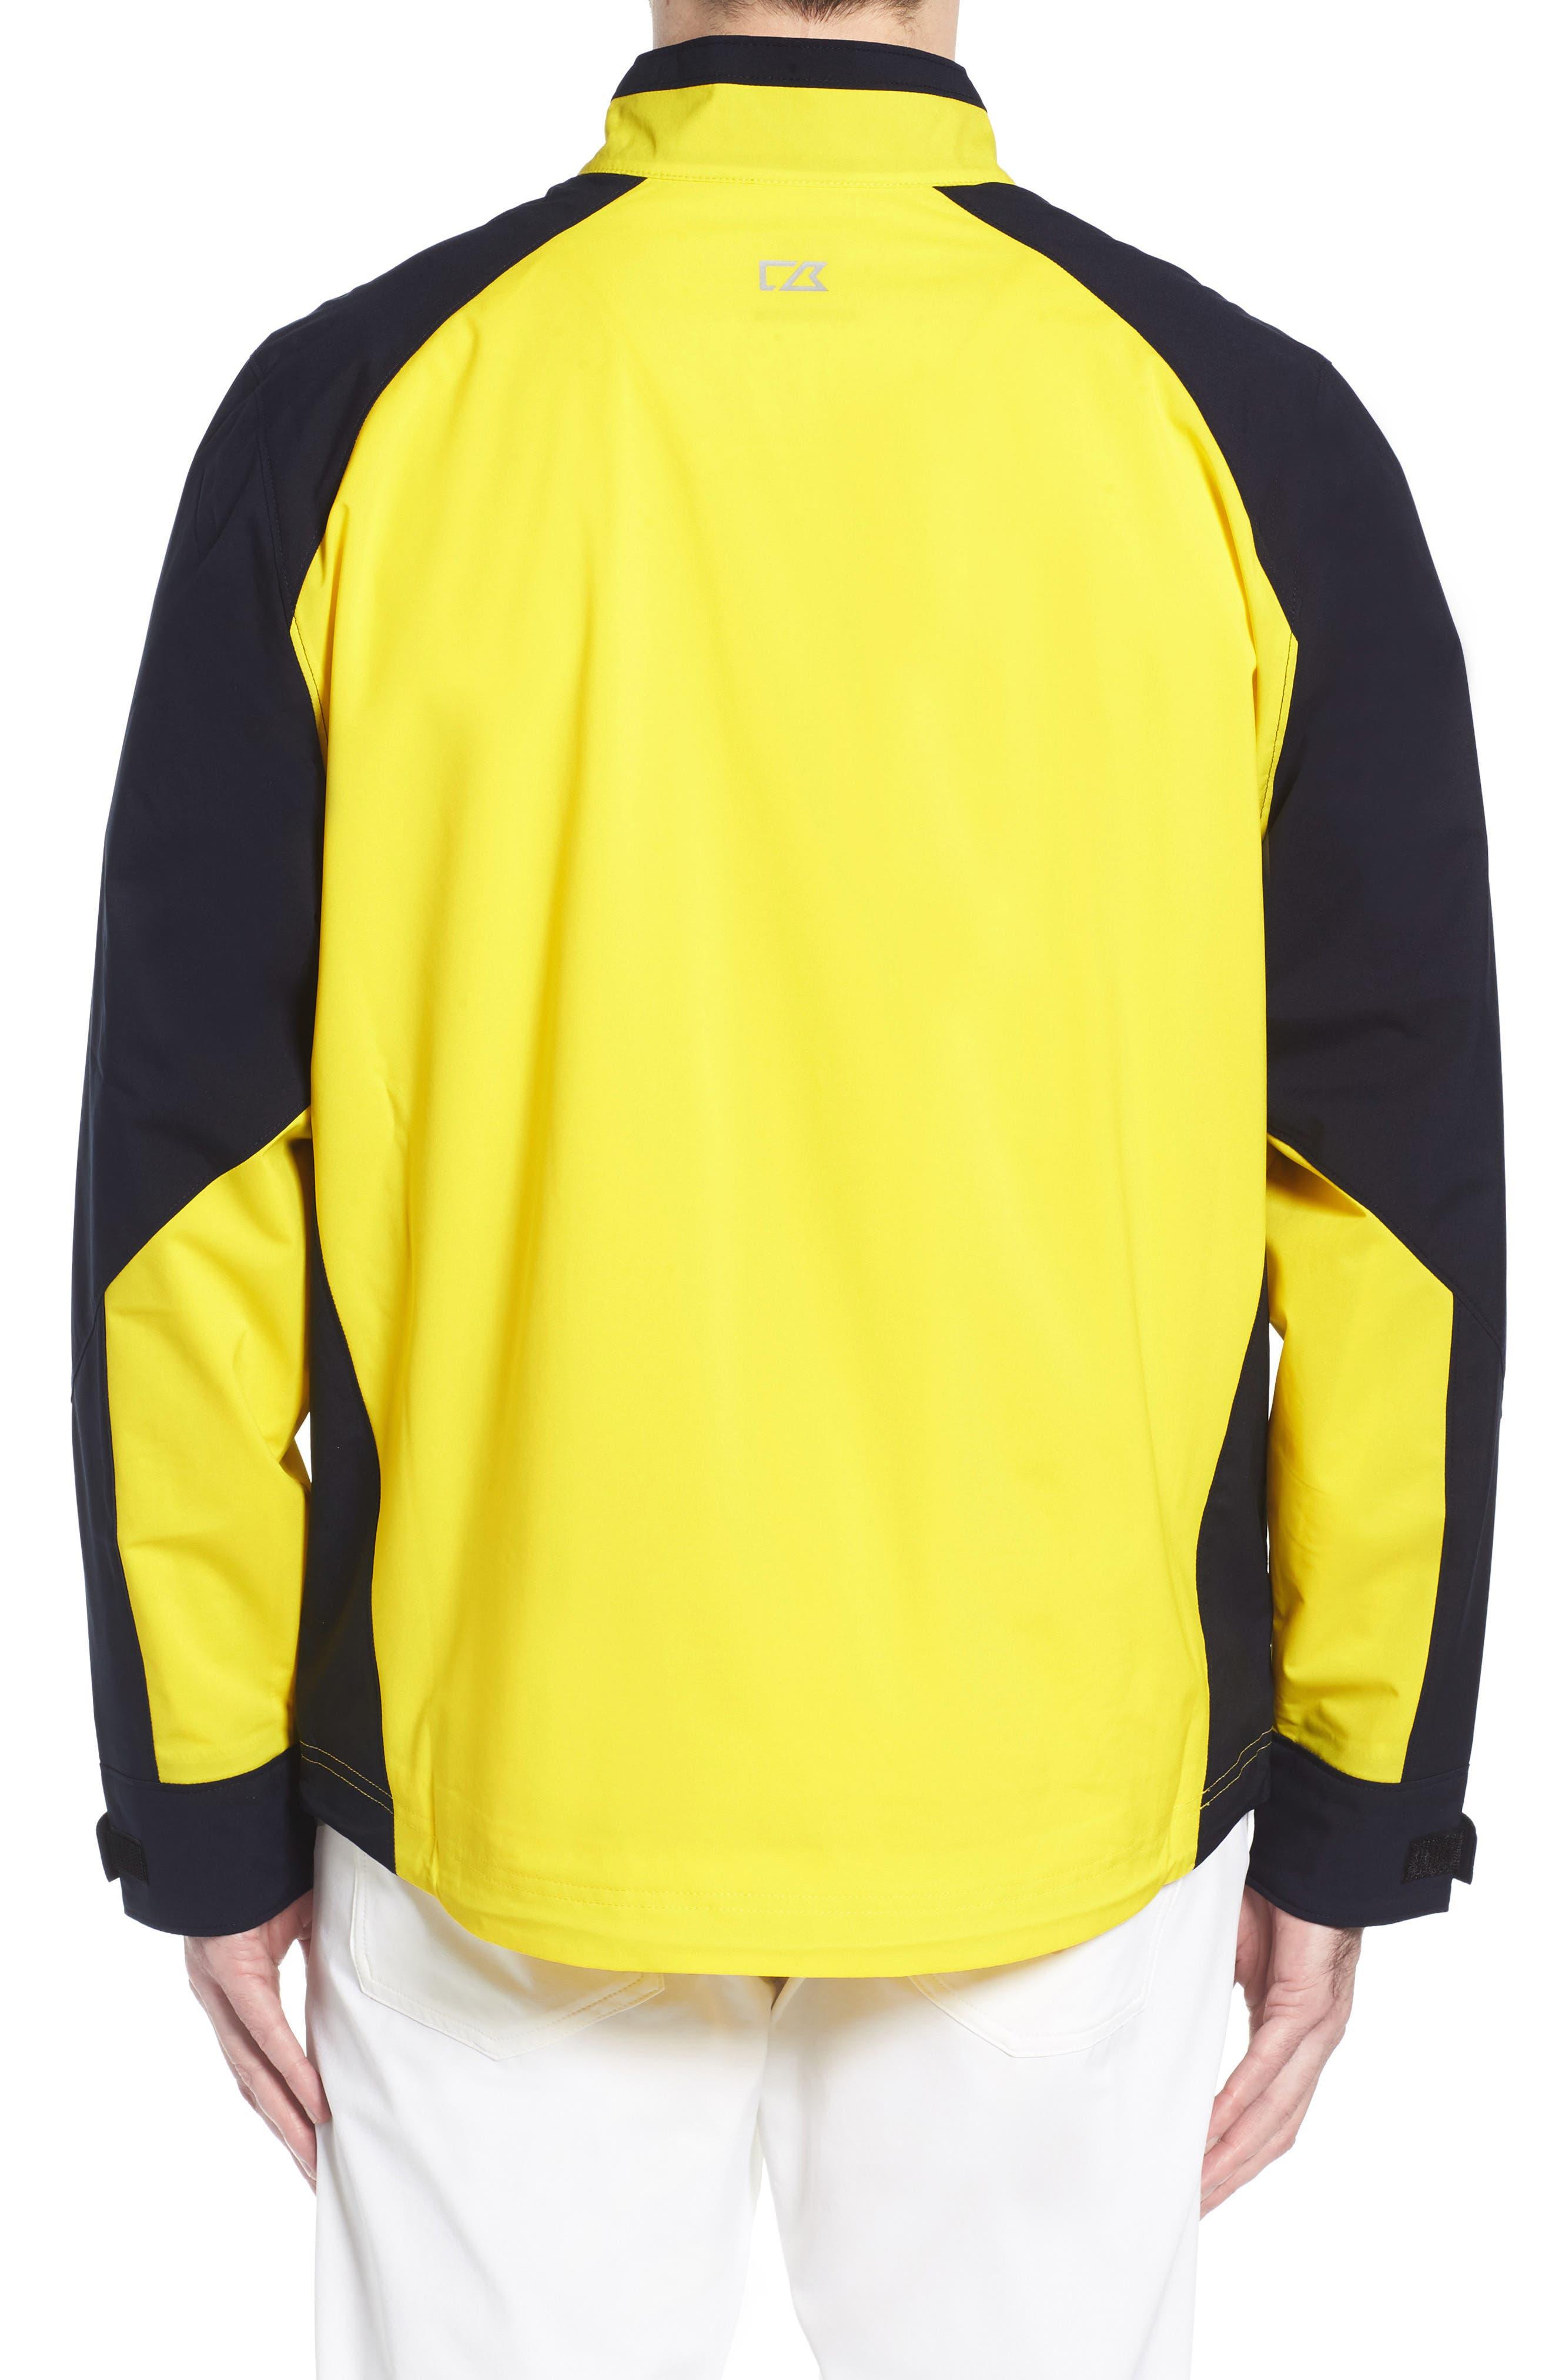 'Summit' WeatherTec Wind & Water Resistant Half Zip Jacket,                             Alternate thumbnail 2, color,                             GALAXY